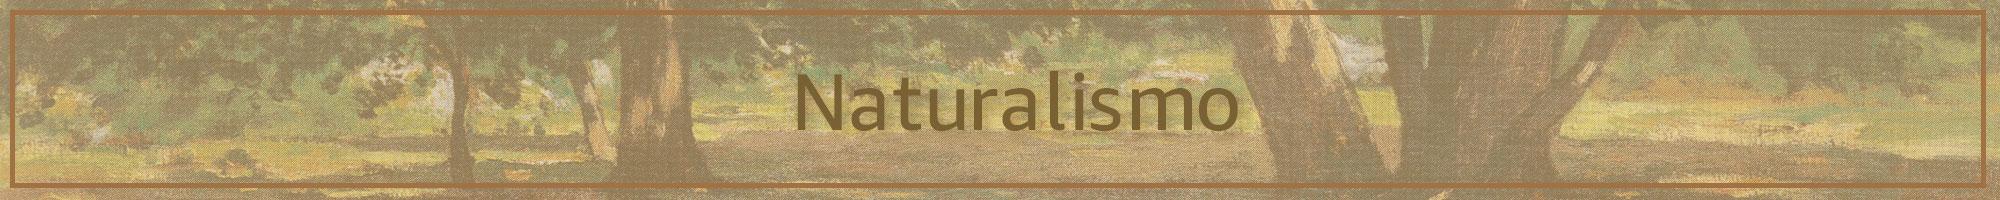 Realismo, Naturalismo, Parnasianismo, Simbolismo